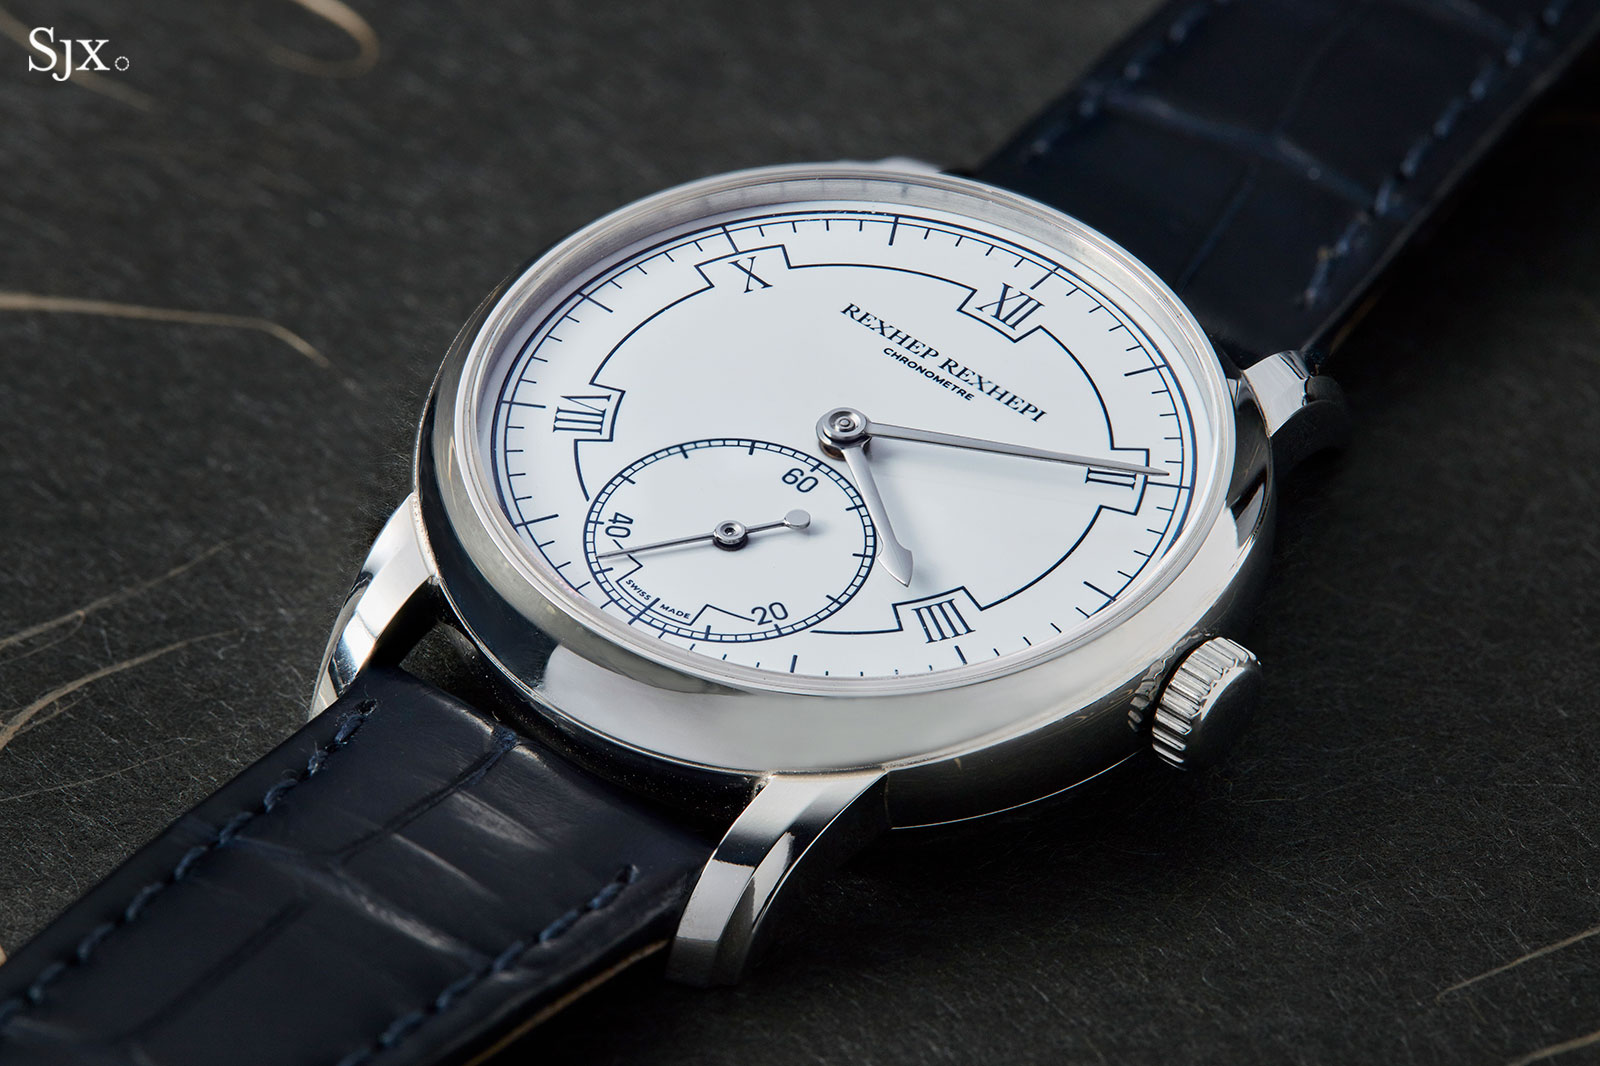 Akrivia Chronometre Contemporain Rexhep Rexhepi 11